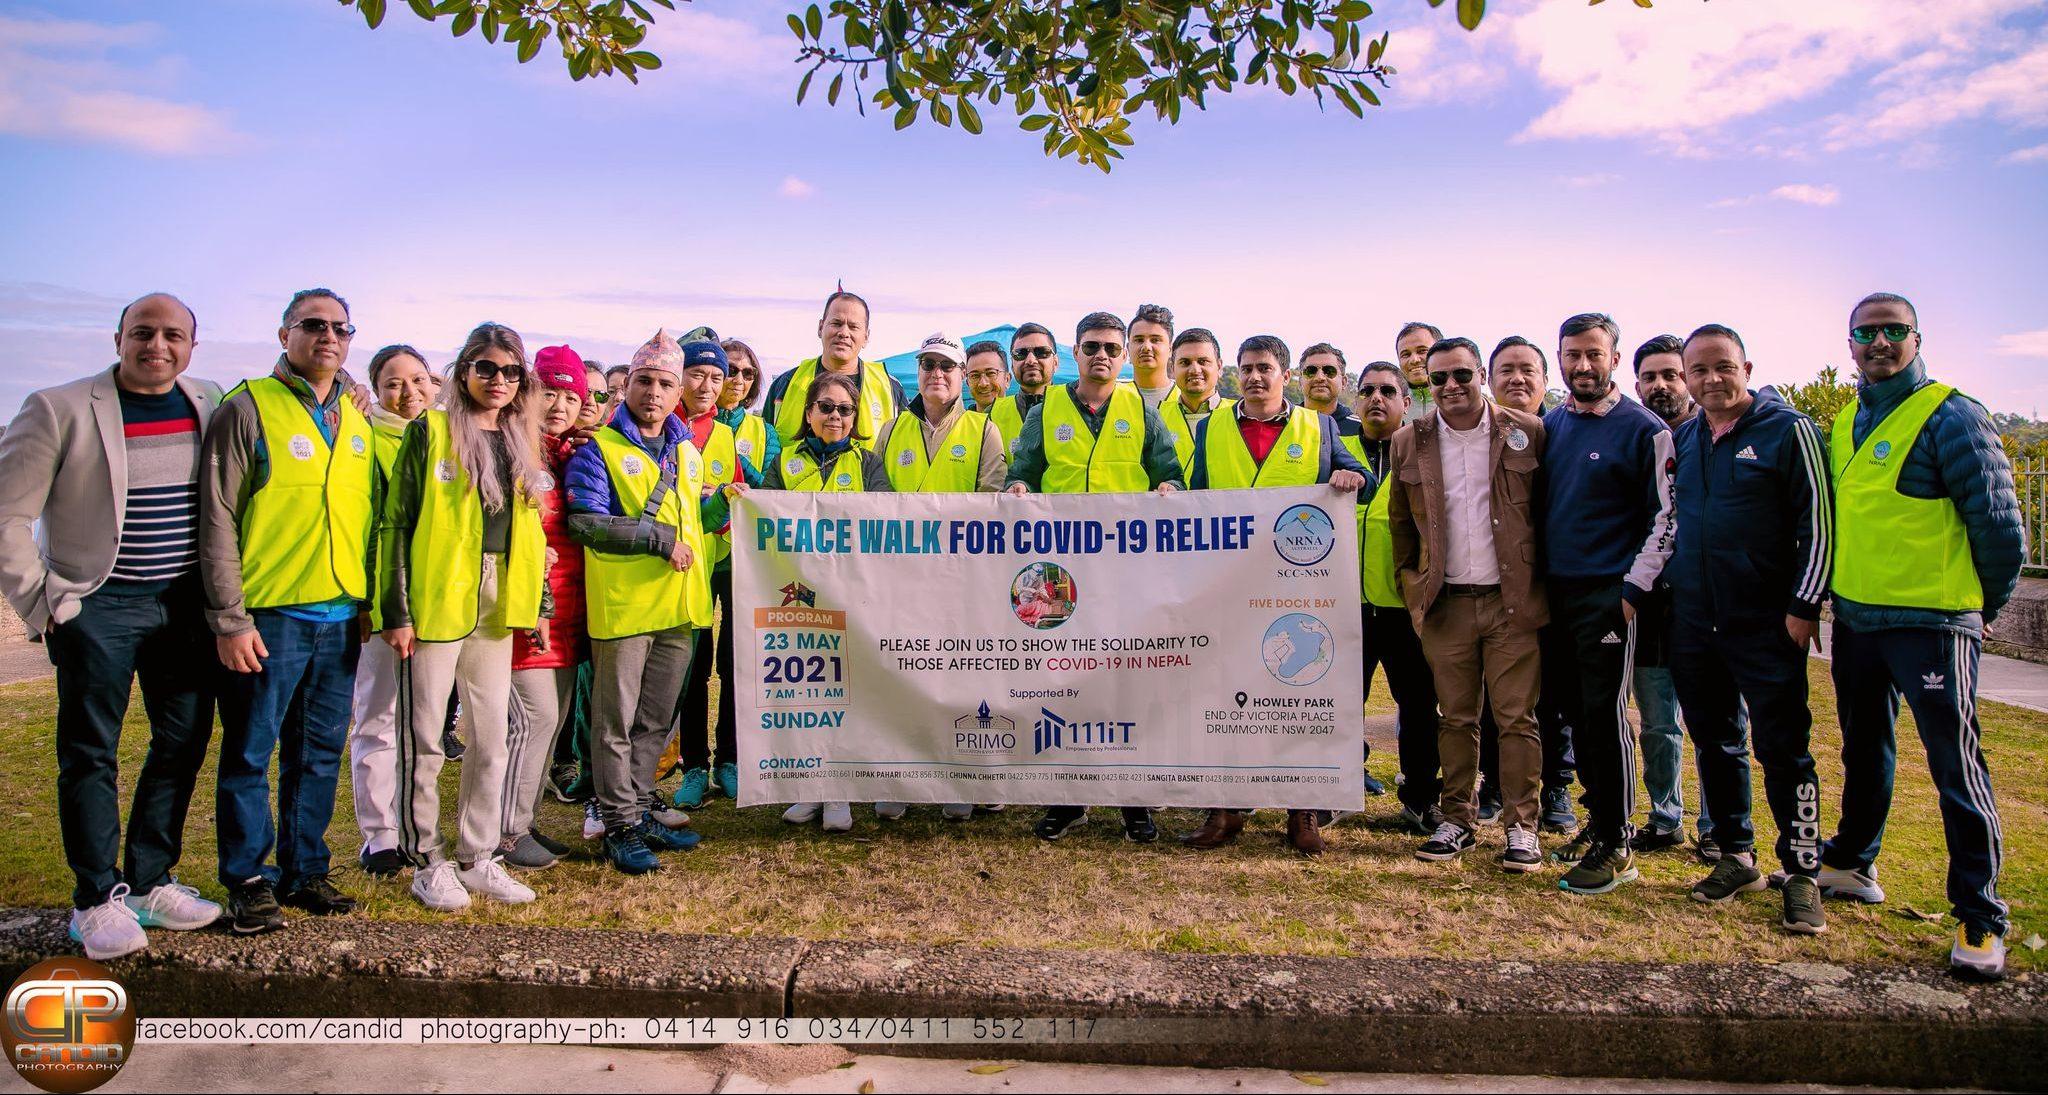 Peace walk for COVID-19 Relief